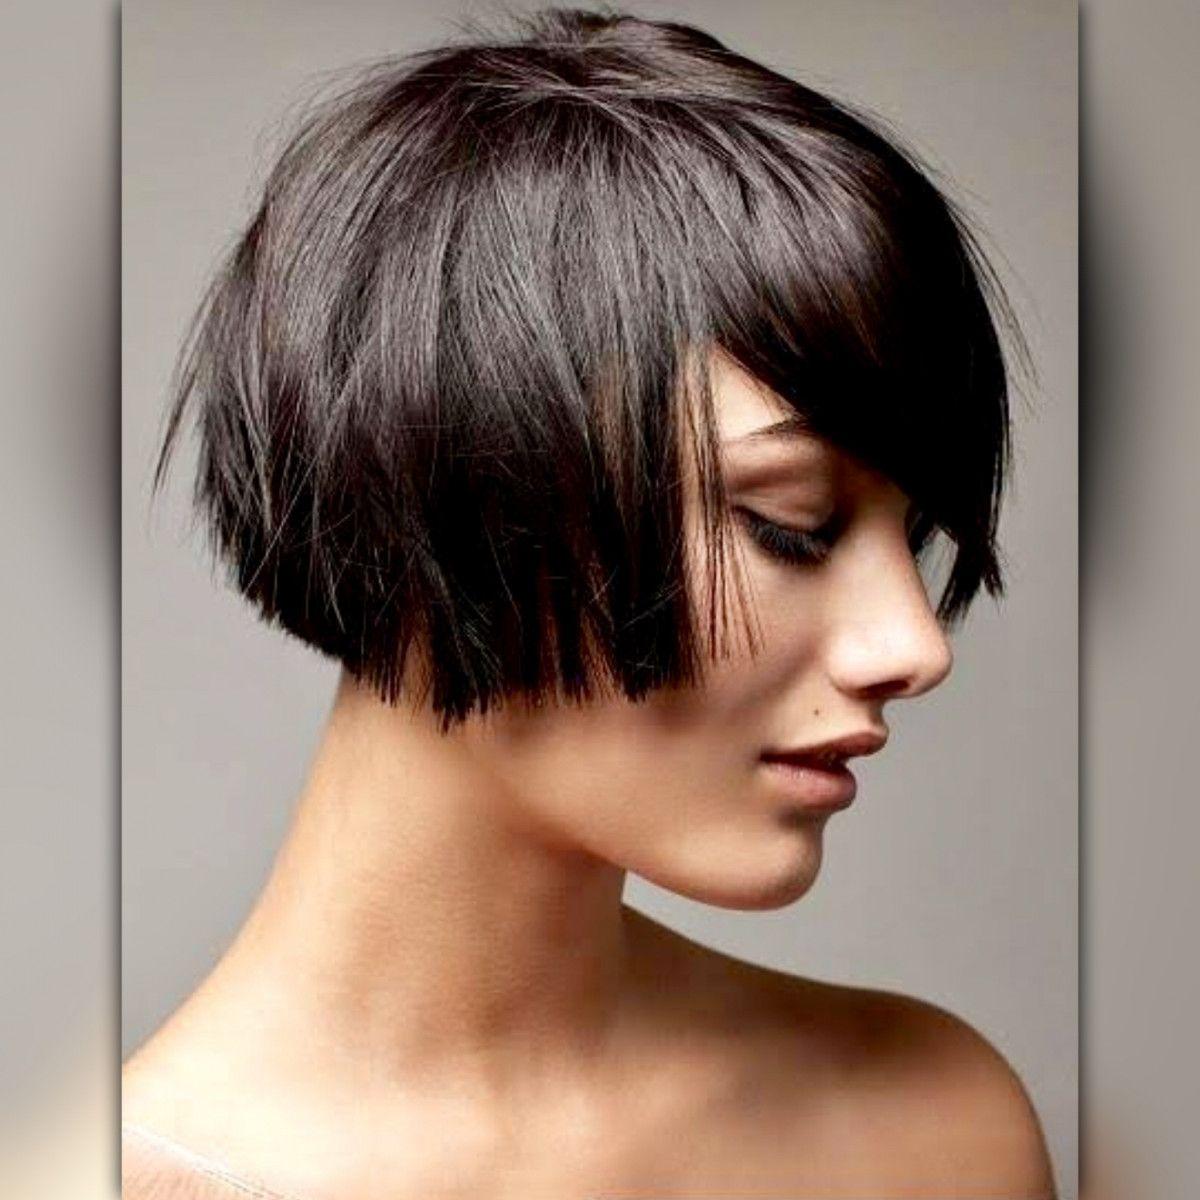 Kurze Frisuren Mode Und Mode Bob Frisur Frisuren Kurzhaarfrisuren